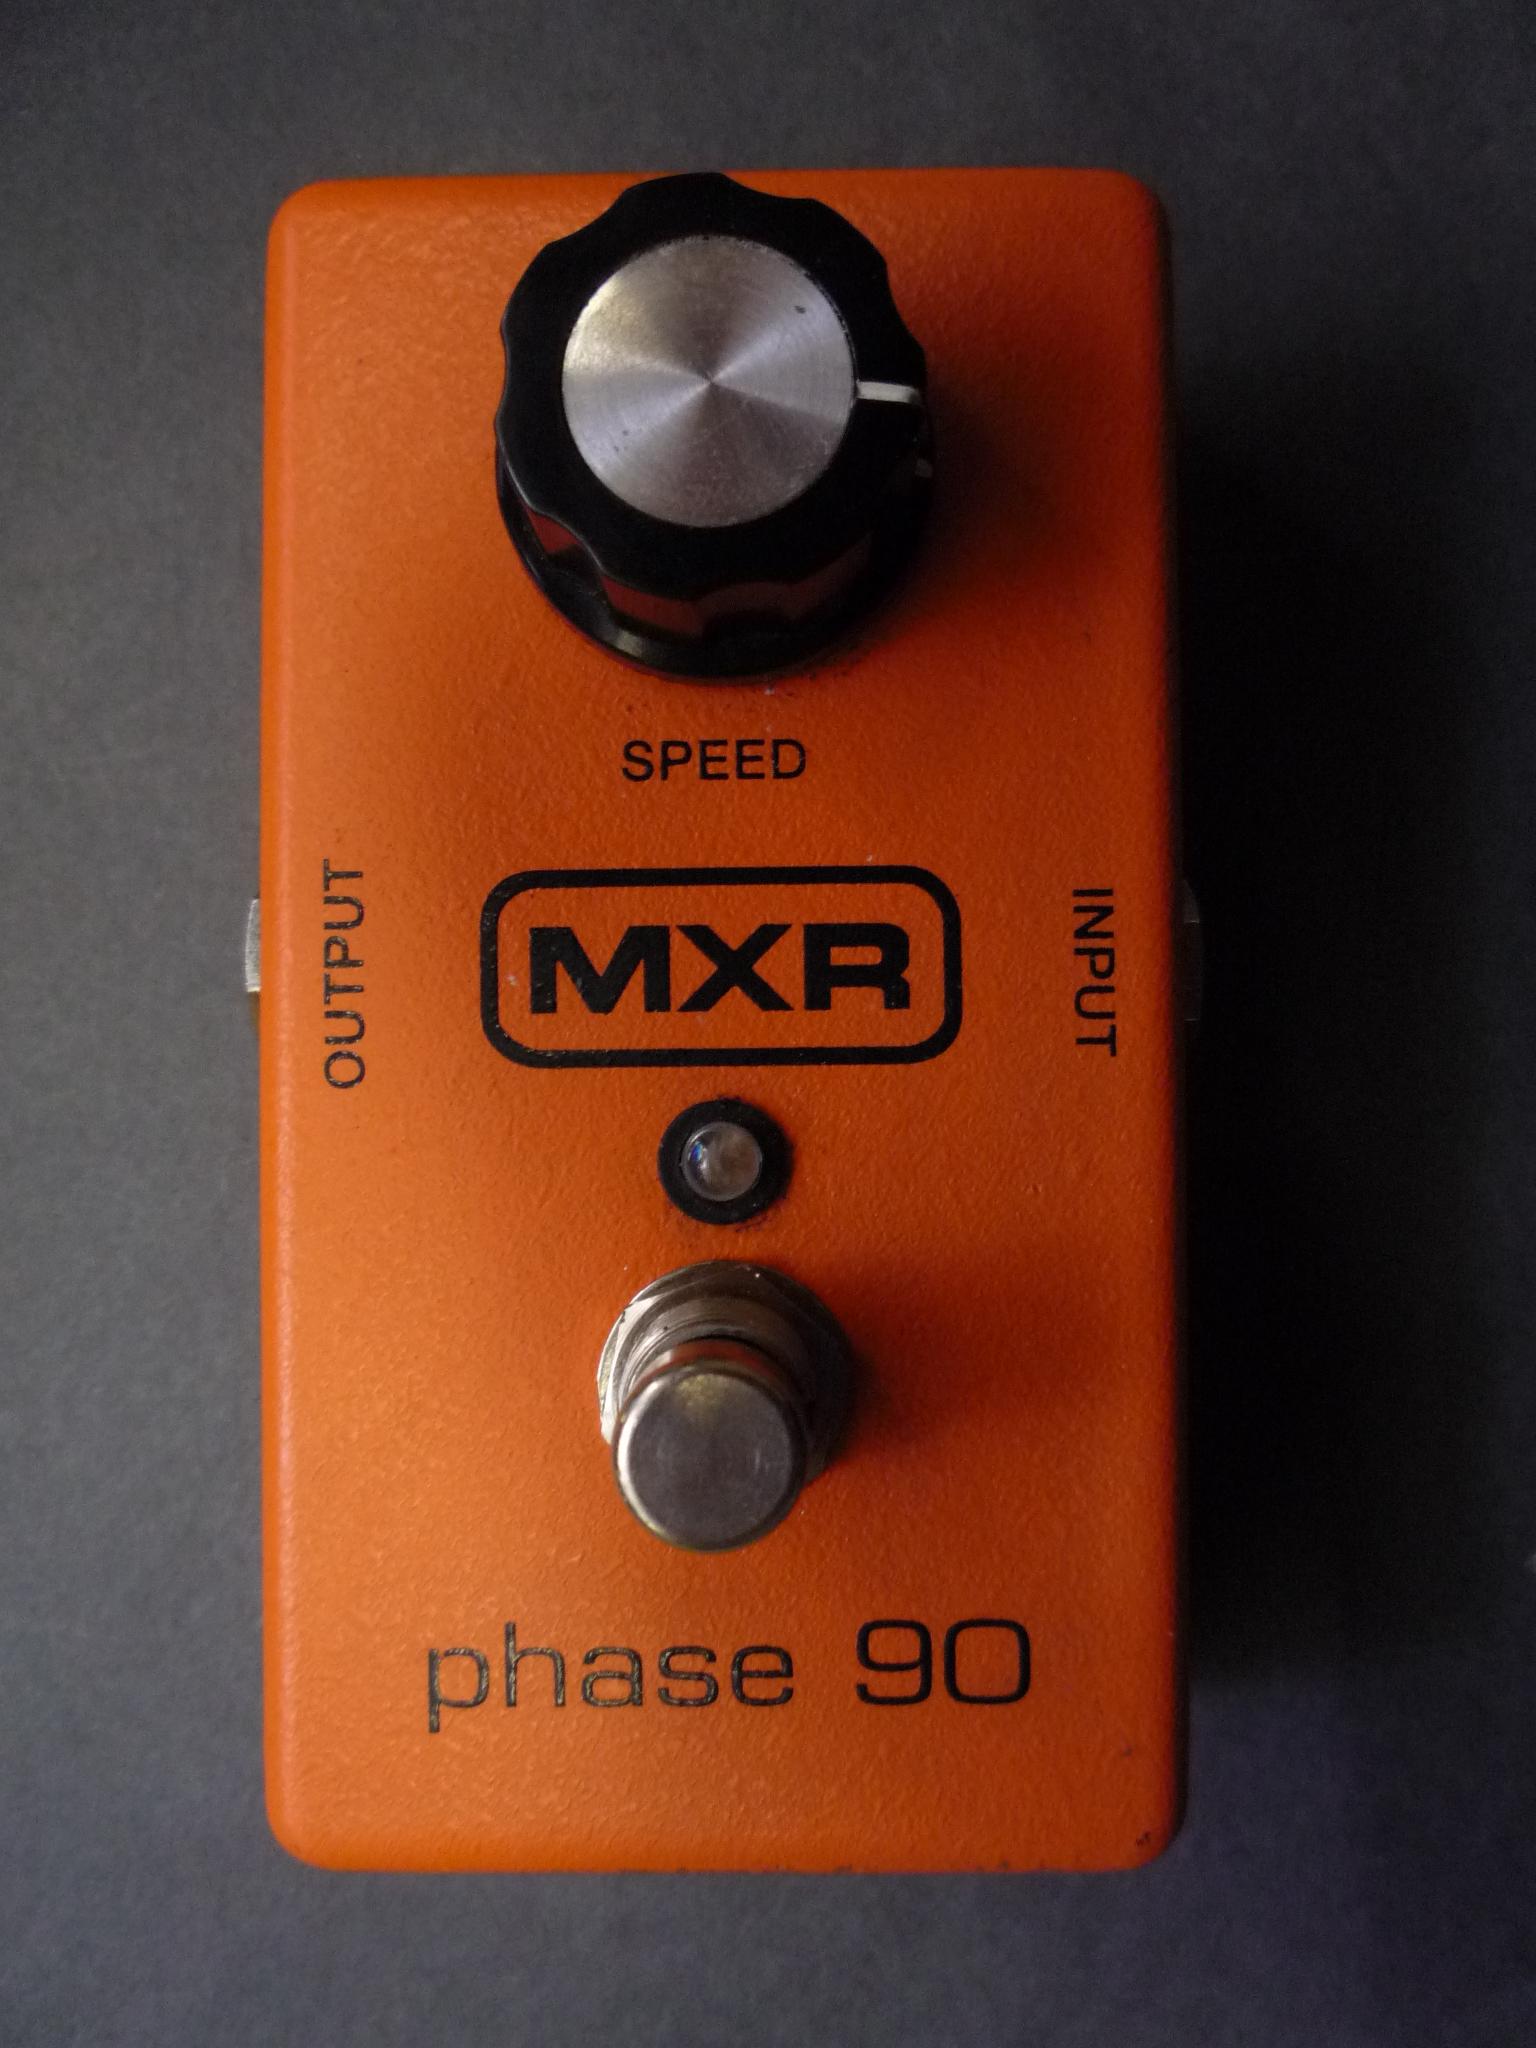 Amazon.com: MXR M101 Phase 90: Musical Instruments